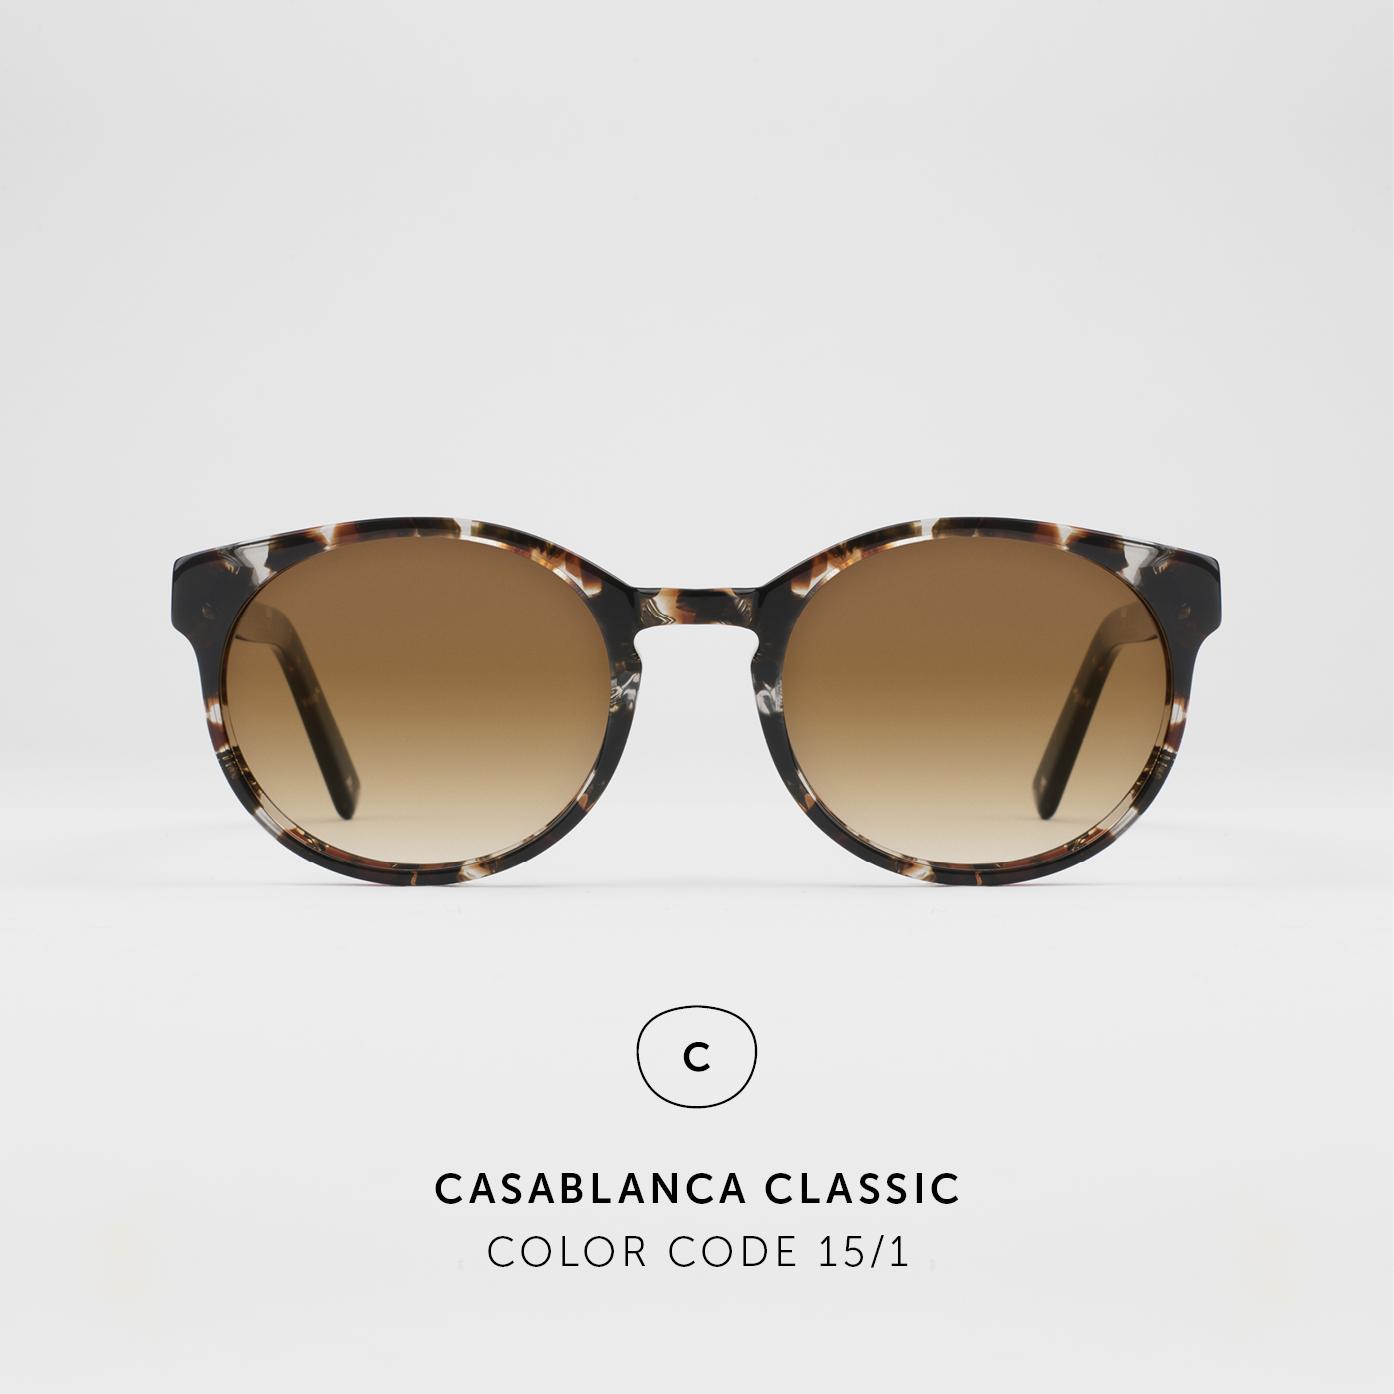 CasablancaClassic39.jpg